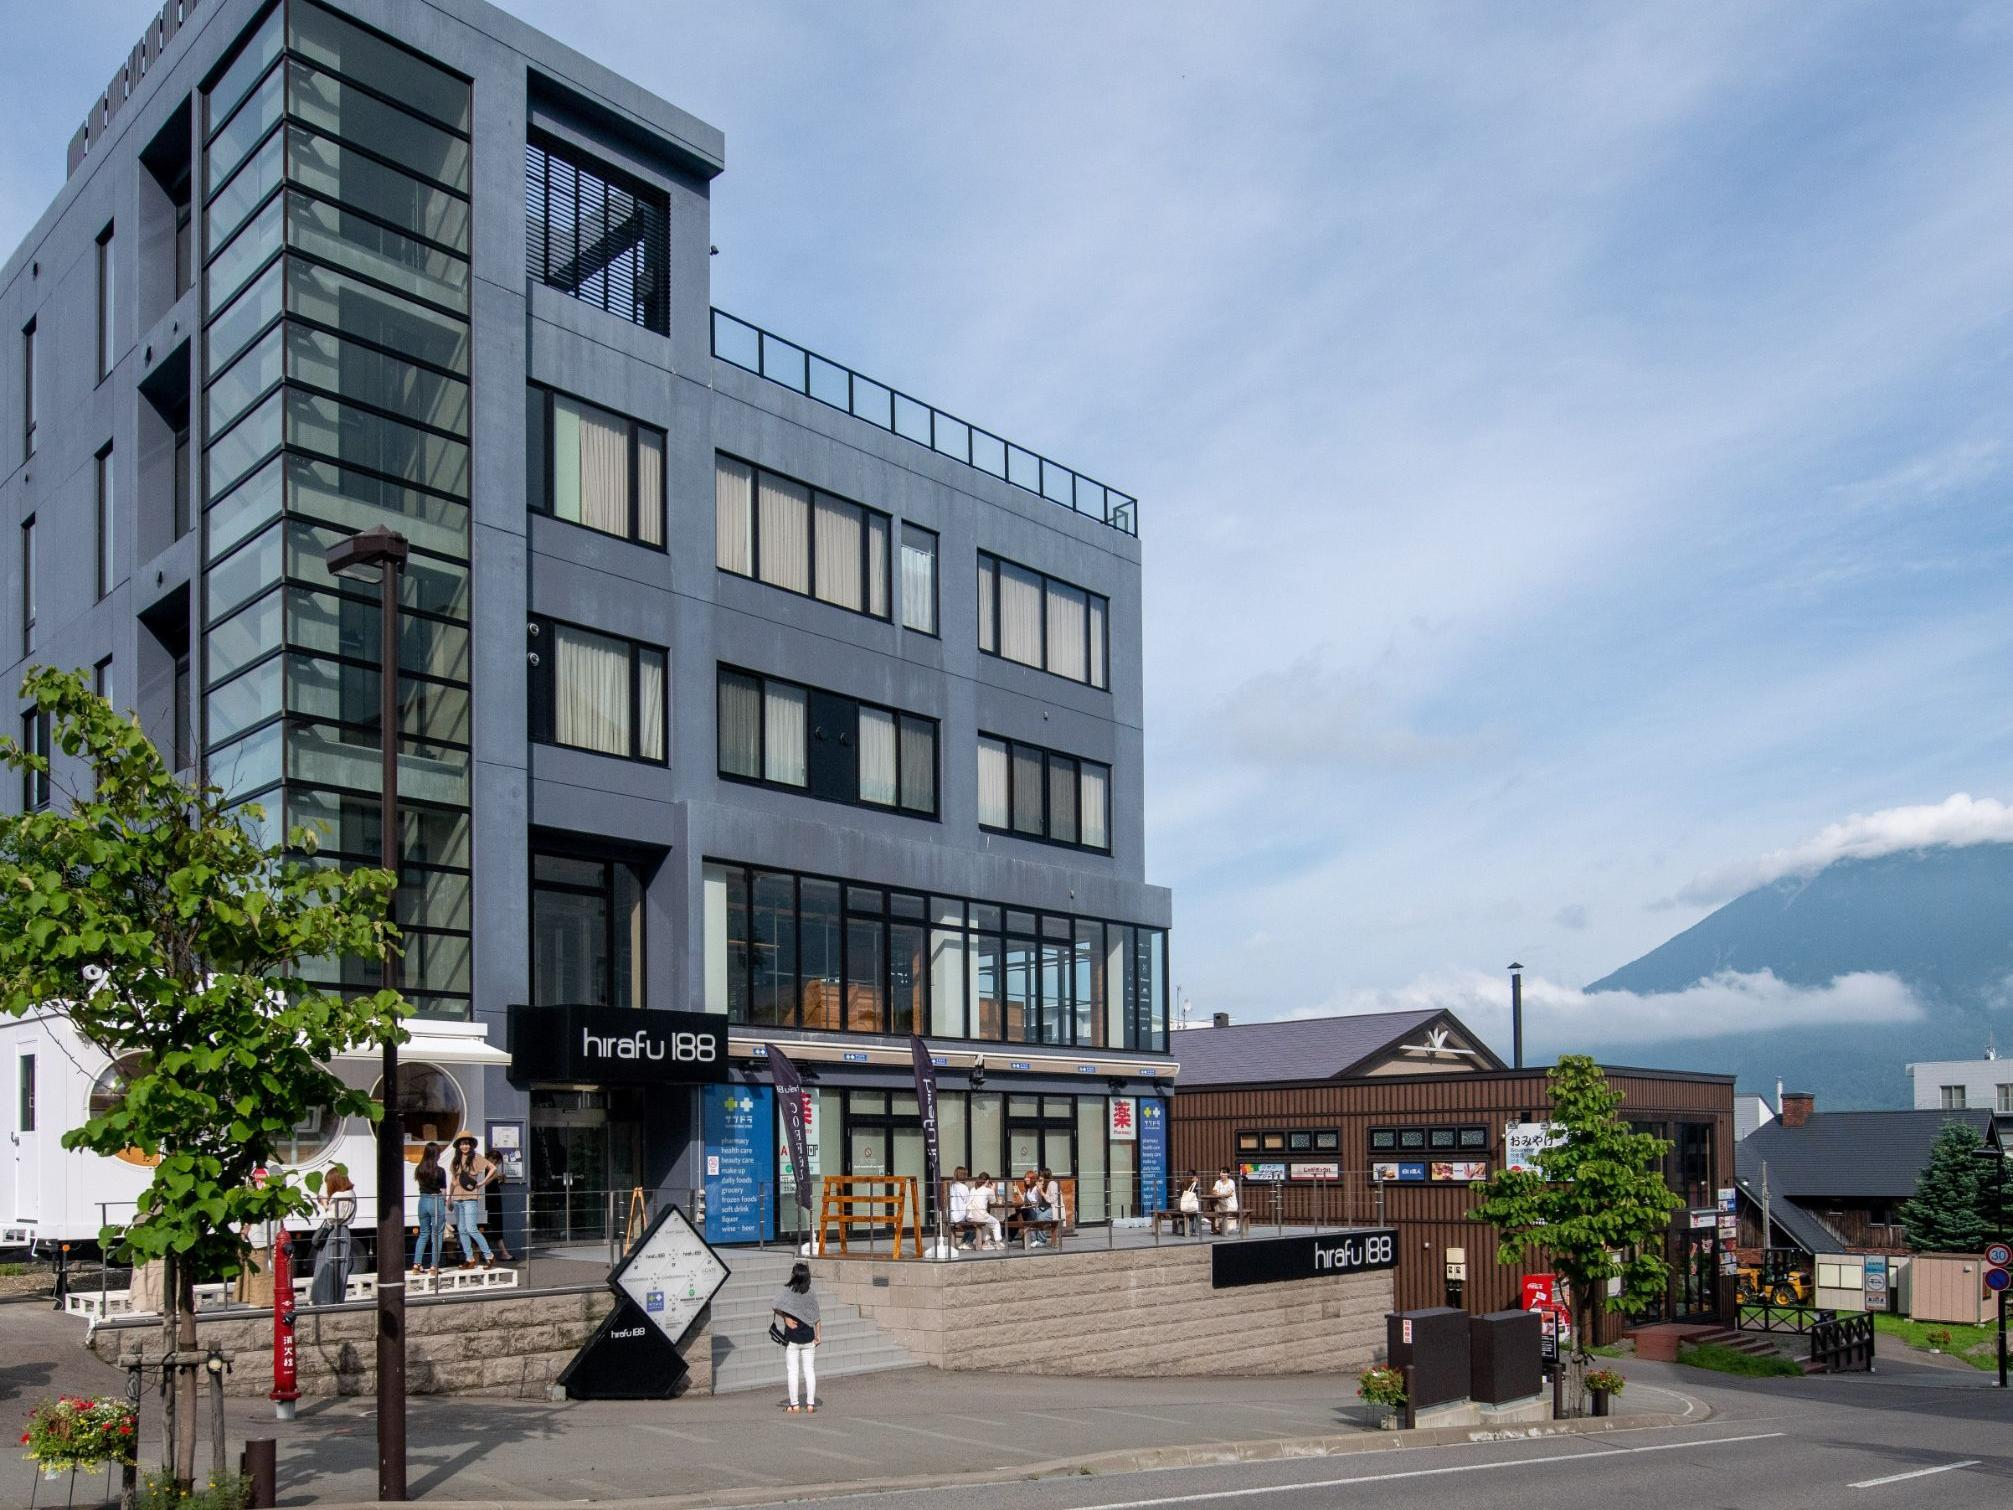 Exterior view of Sapporo drug store near Chatrium Niseko Japan